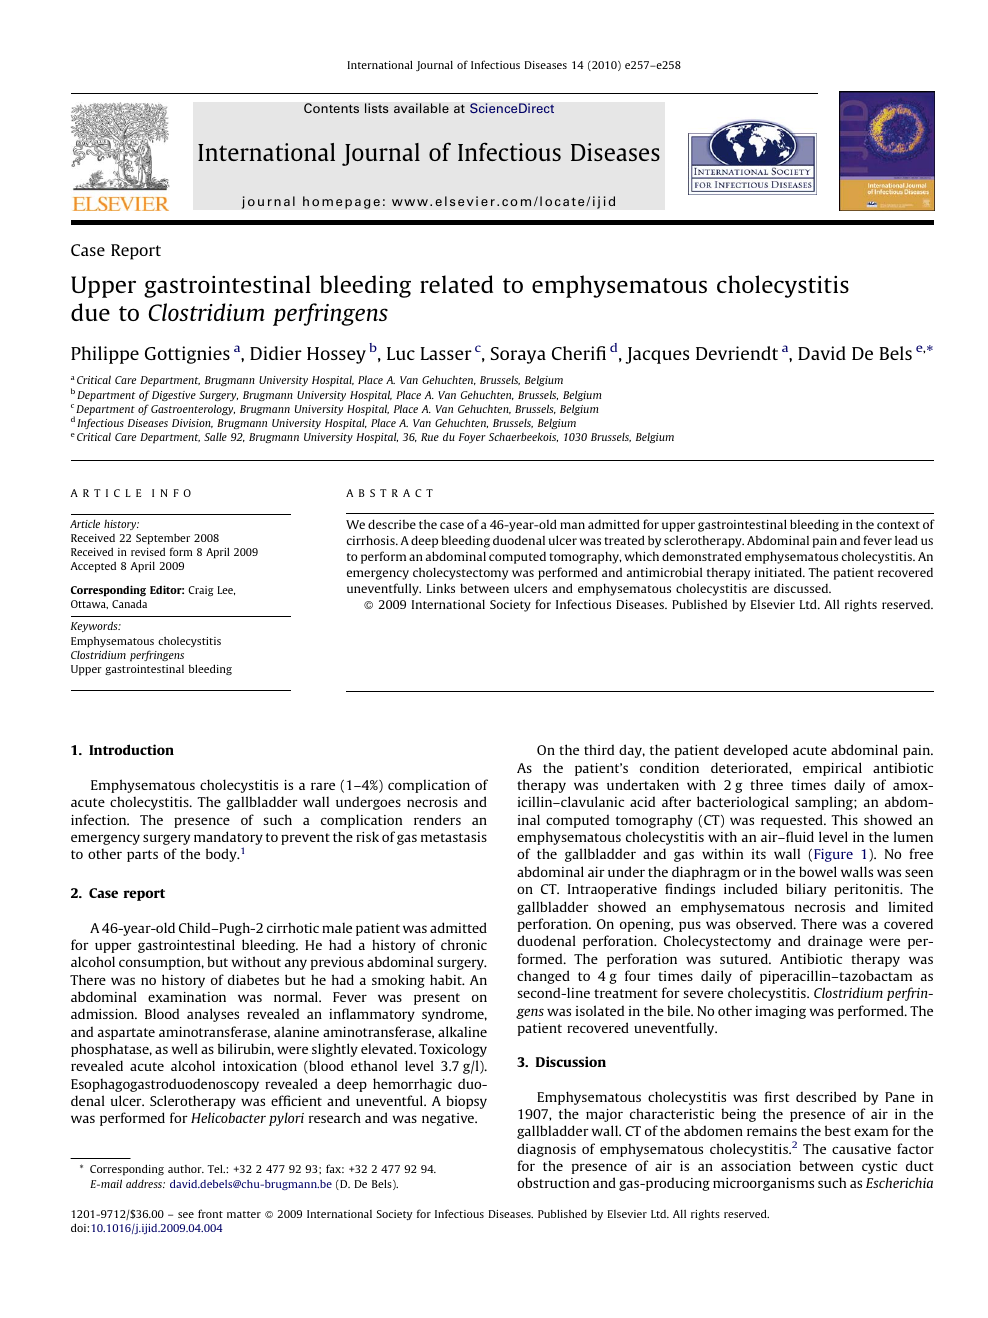 Upper Gastrointestinal Bleeding Related To Emphysematous